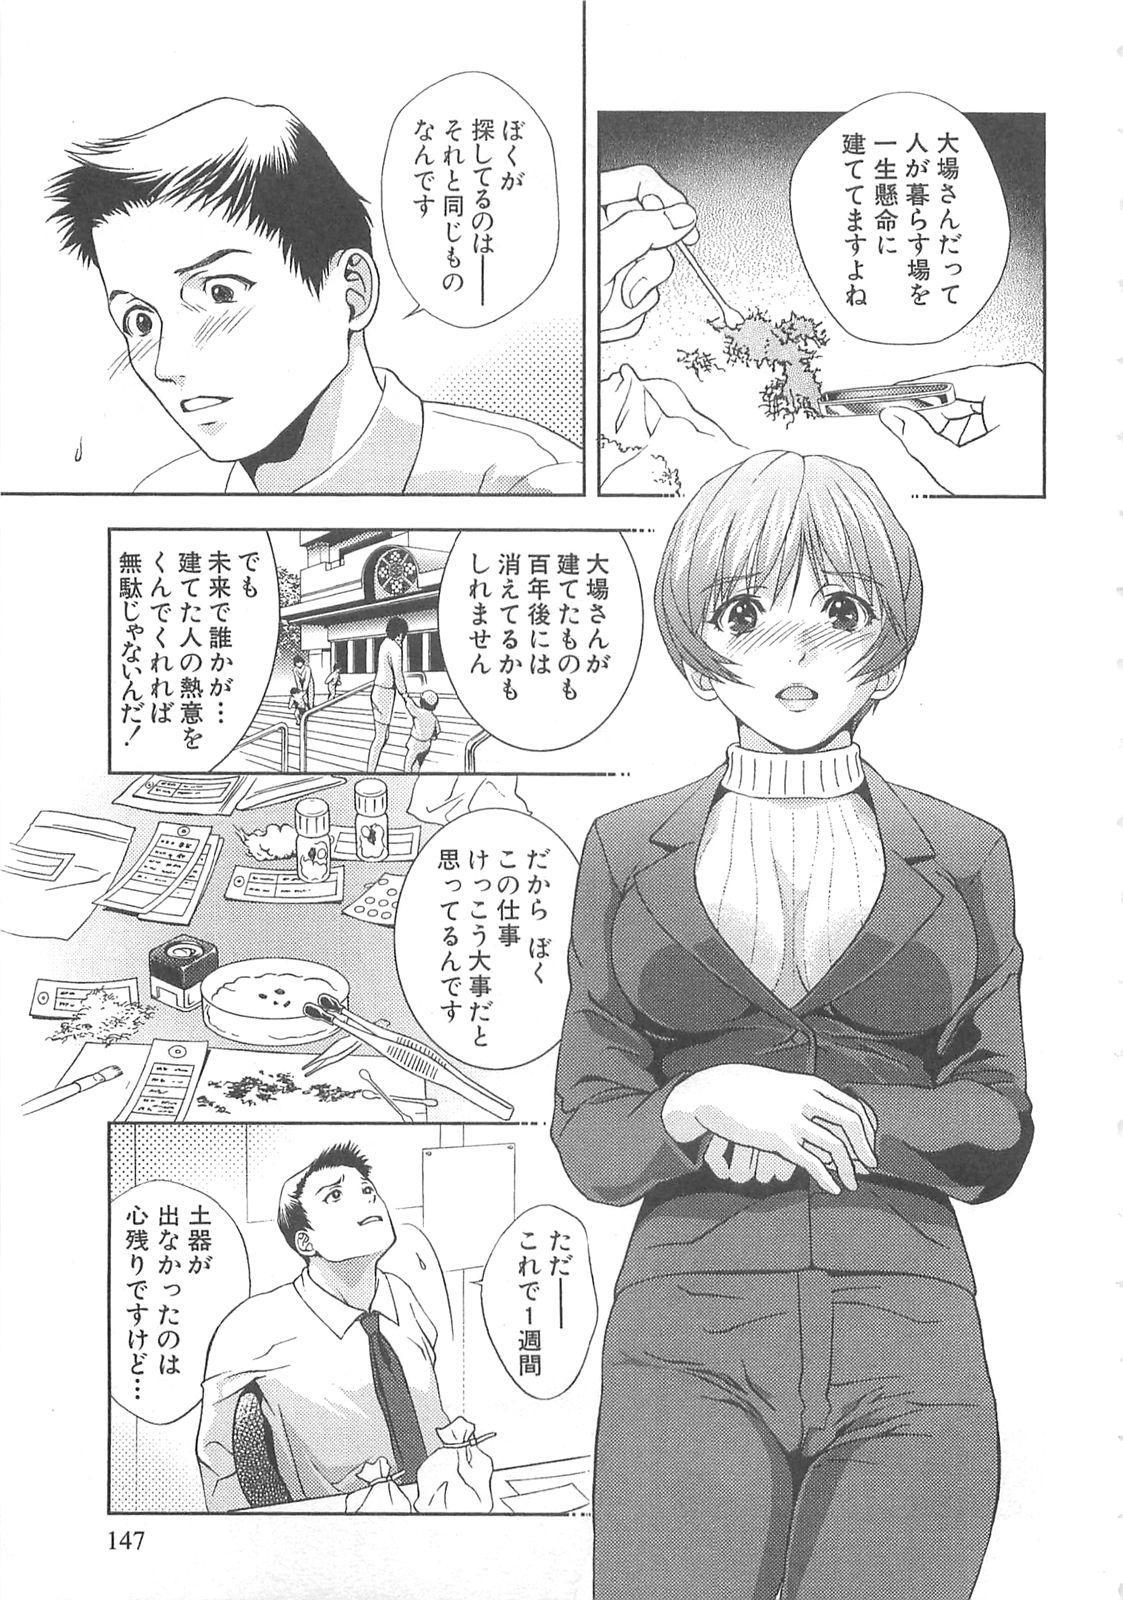 Tenshi no Kyuu - Angel's Pretty Hip 147